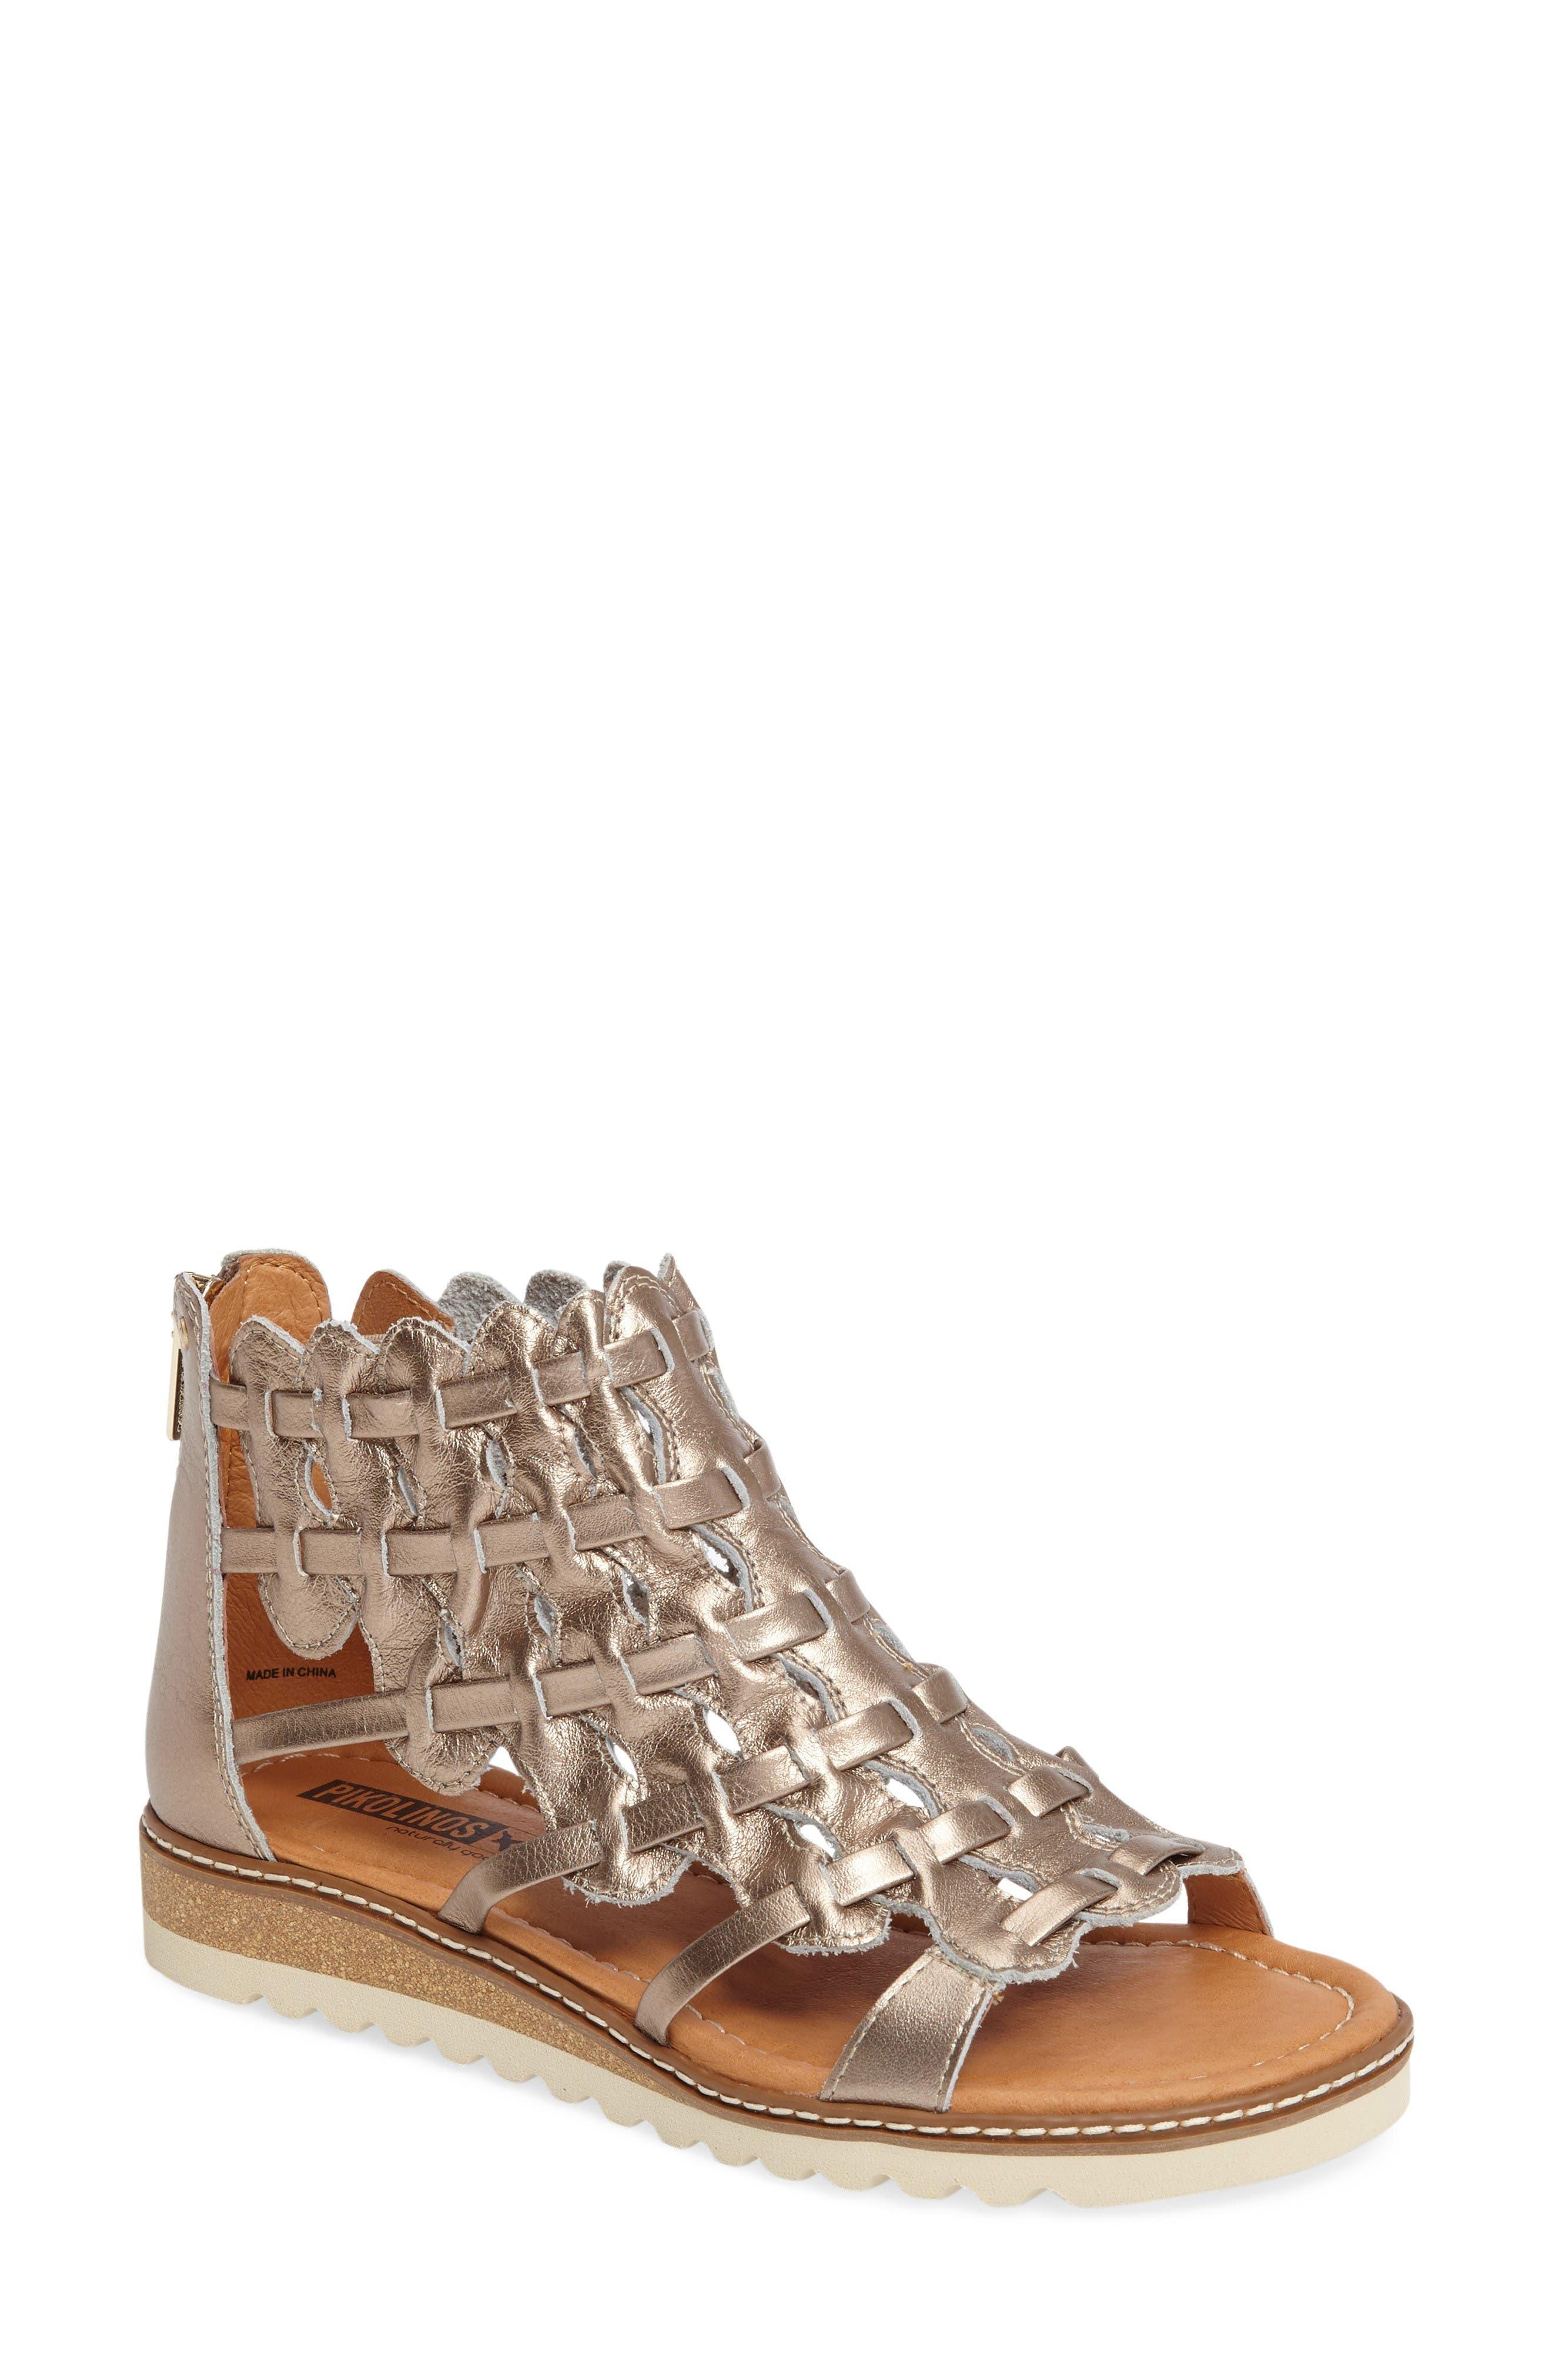 Alcudia Sandal,                         Main,                         color, Onyx Leather